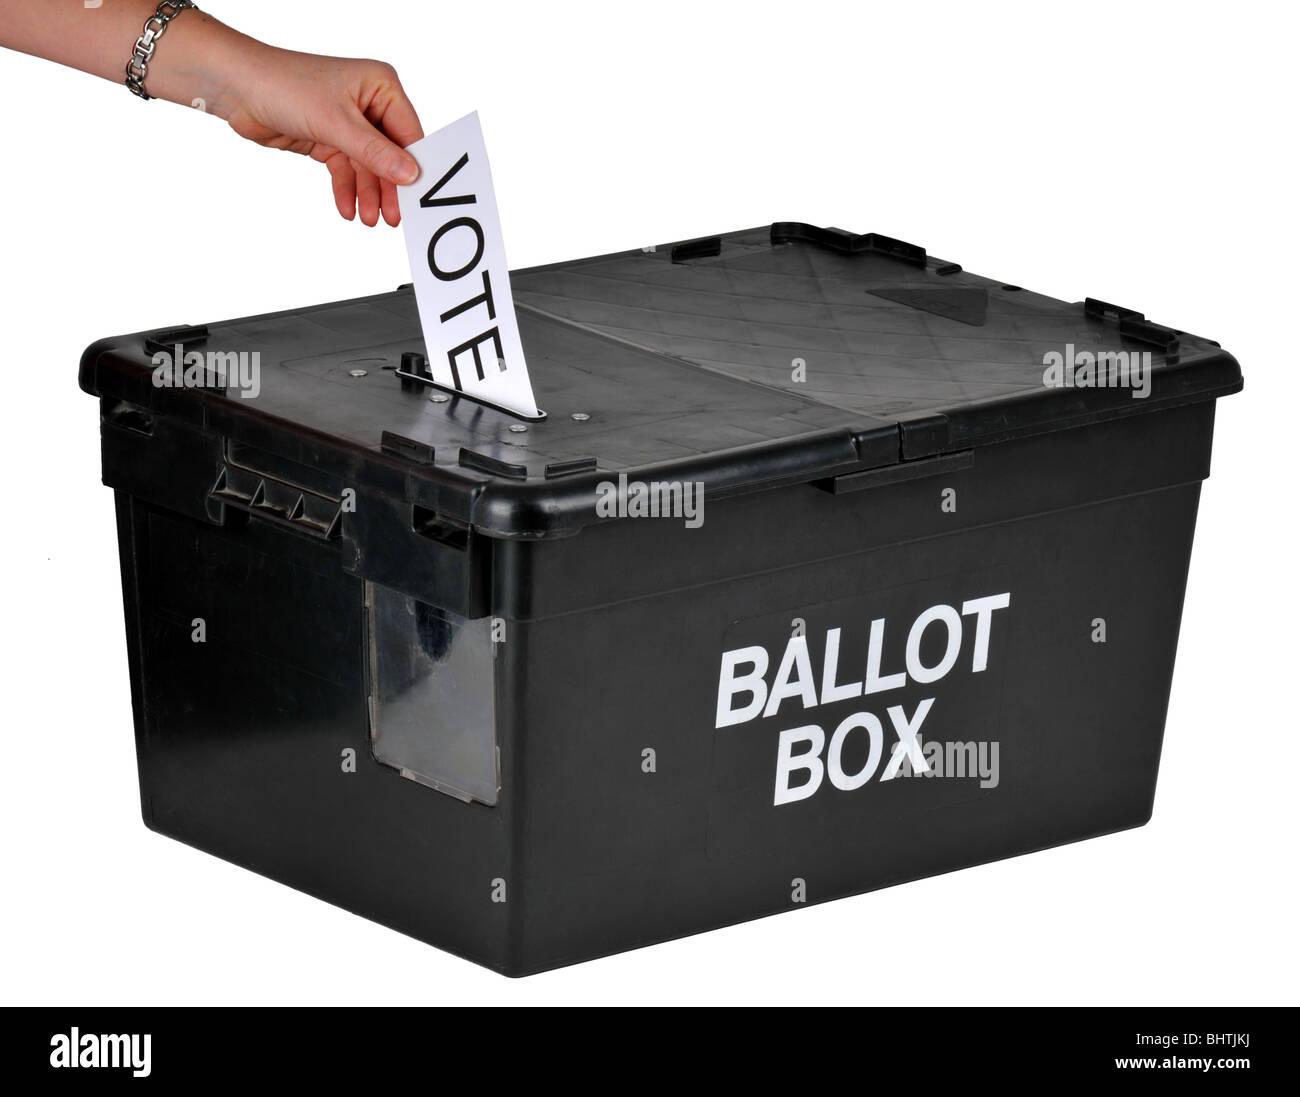 Ballot box, hand placing a vote into a ballot box, voting with ballot box - Stock Image